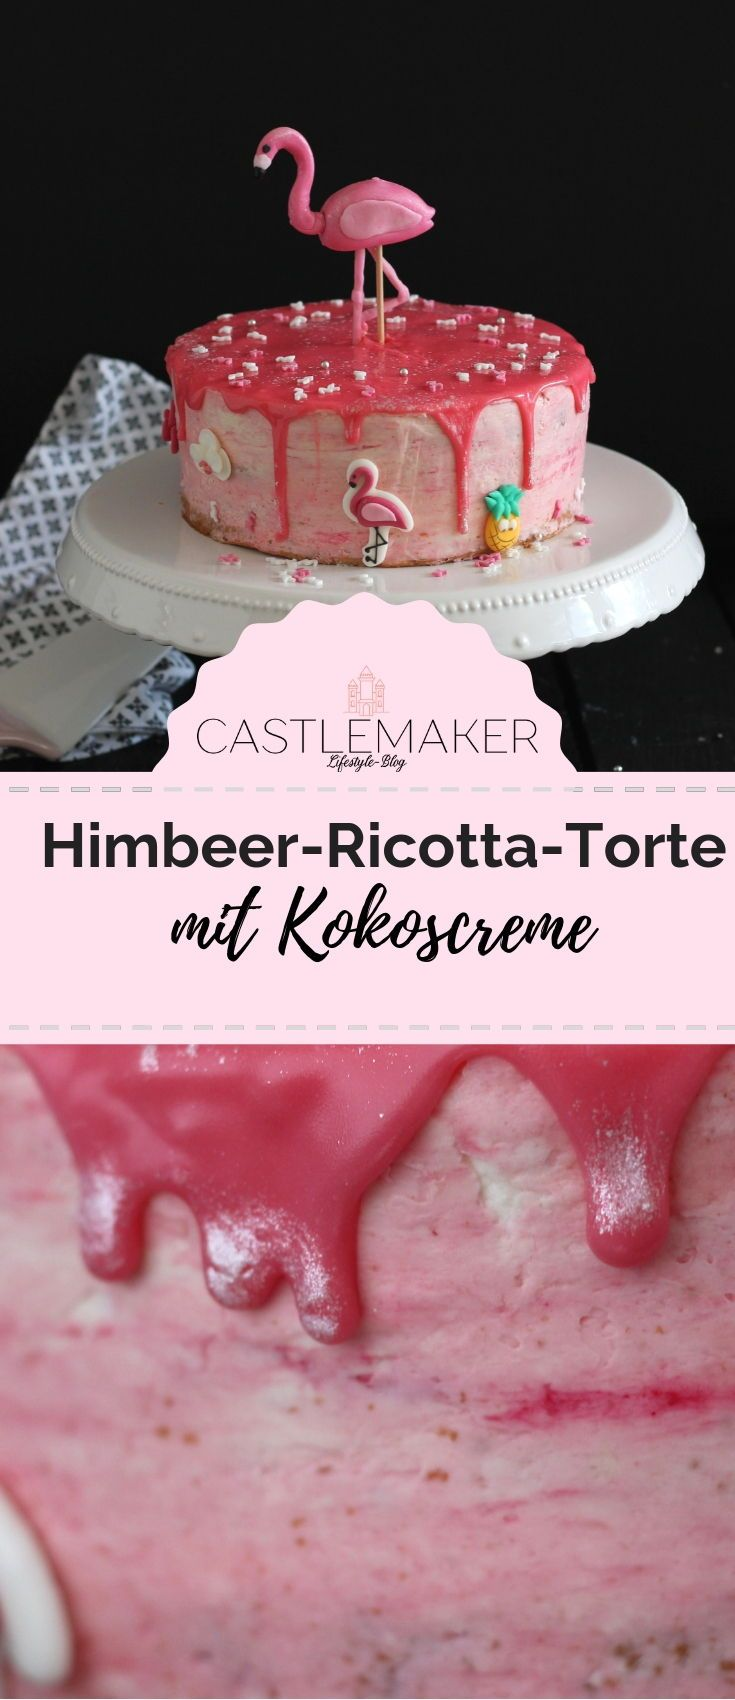 Flamingo-Torte mit Himbeer-Ricotta-Creme & Raffaellocreme « CASTLEMAKER Lifestyle Blog